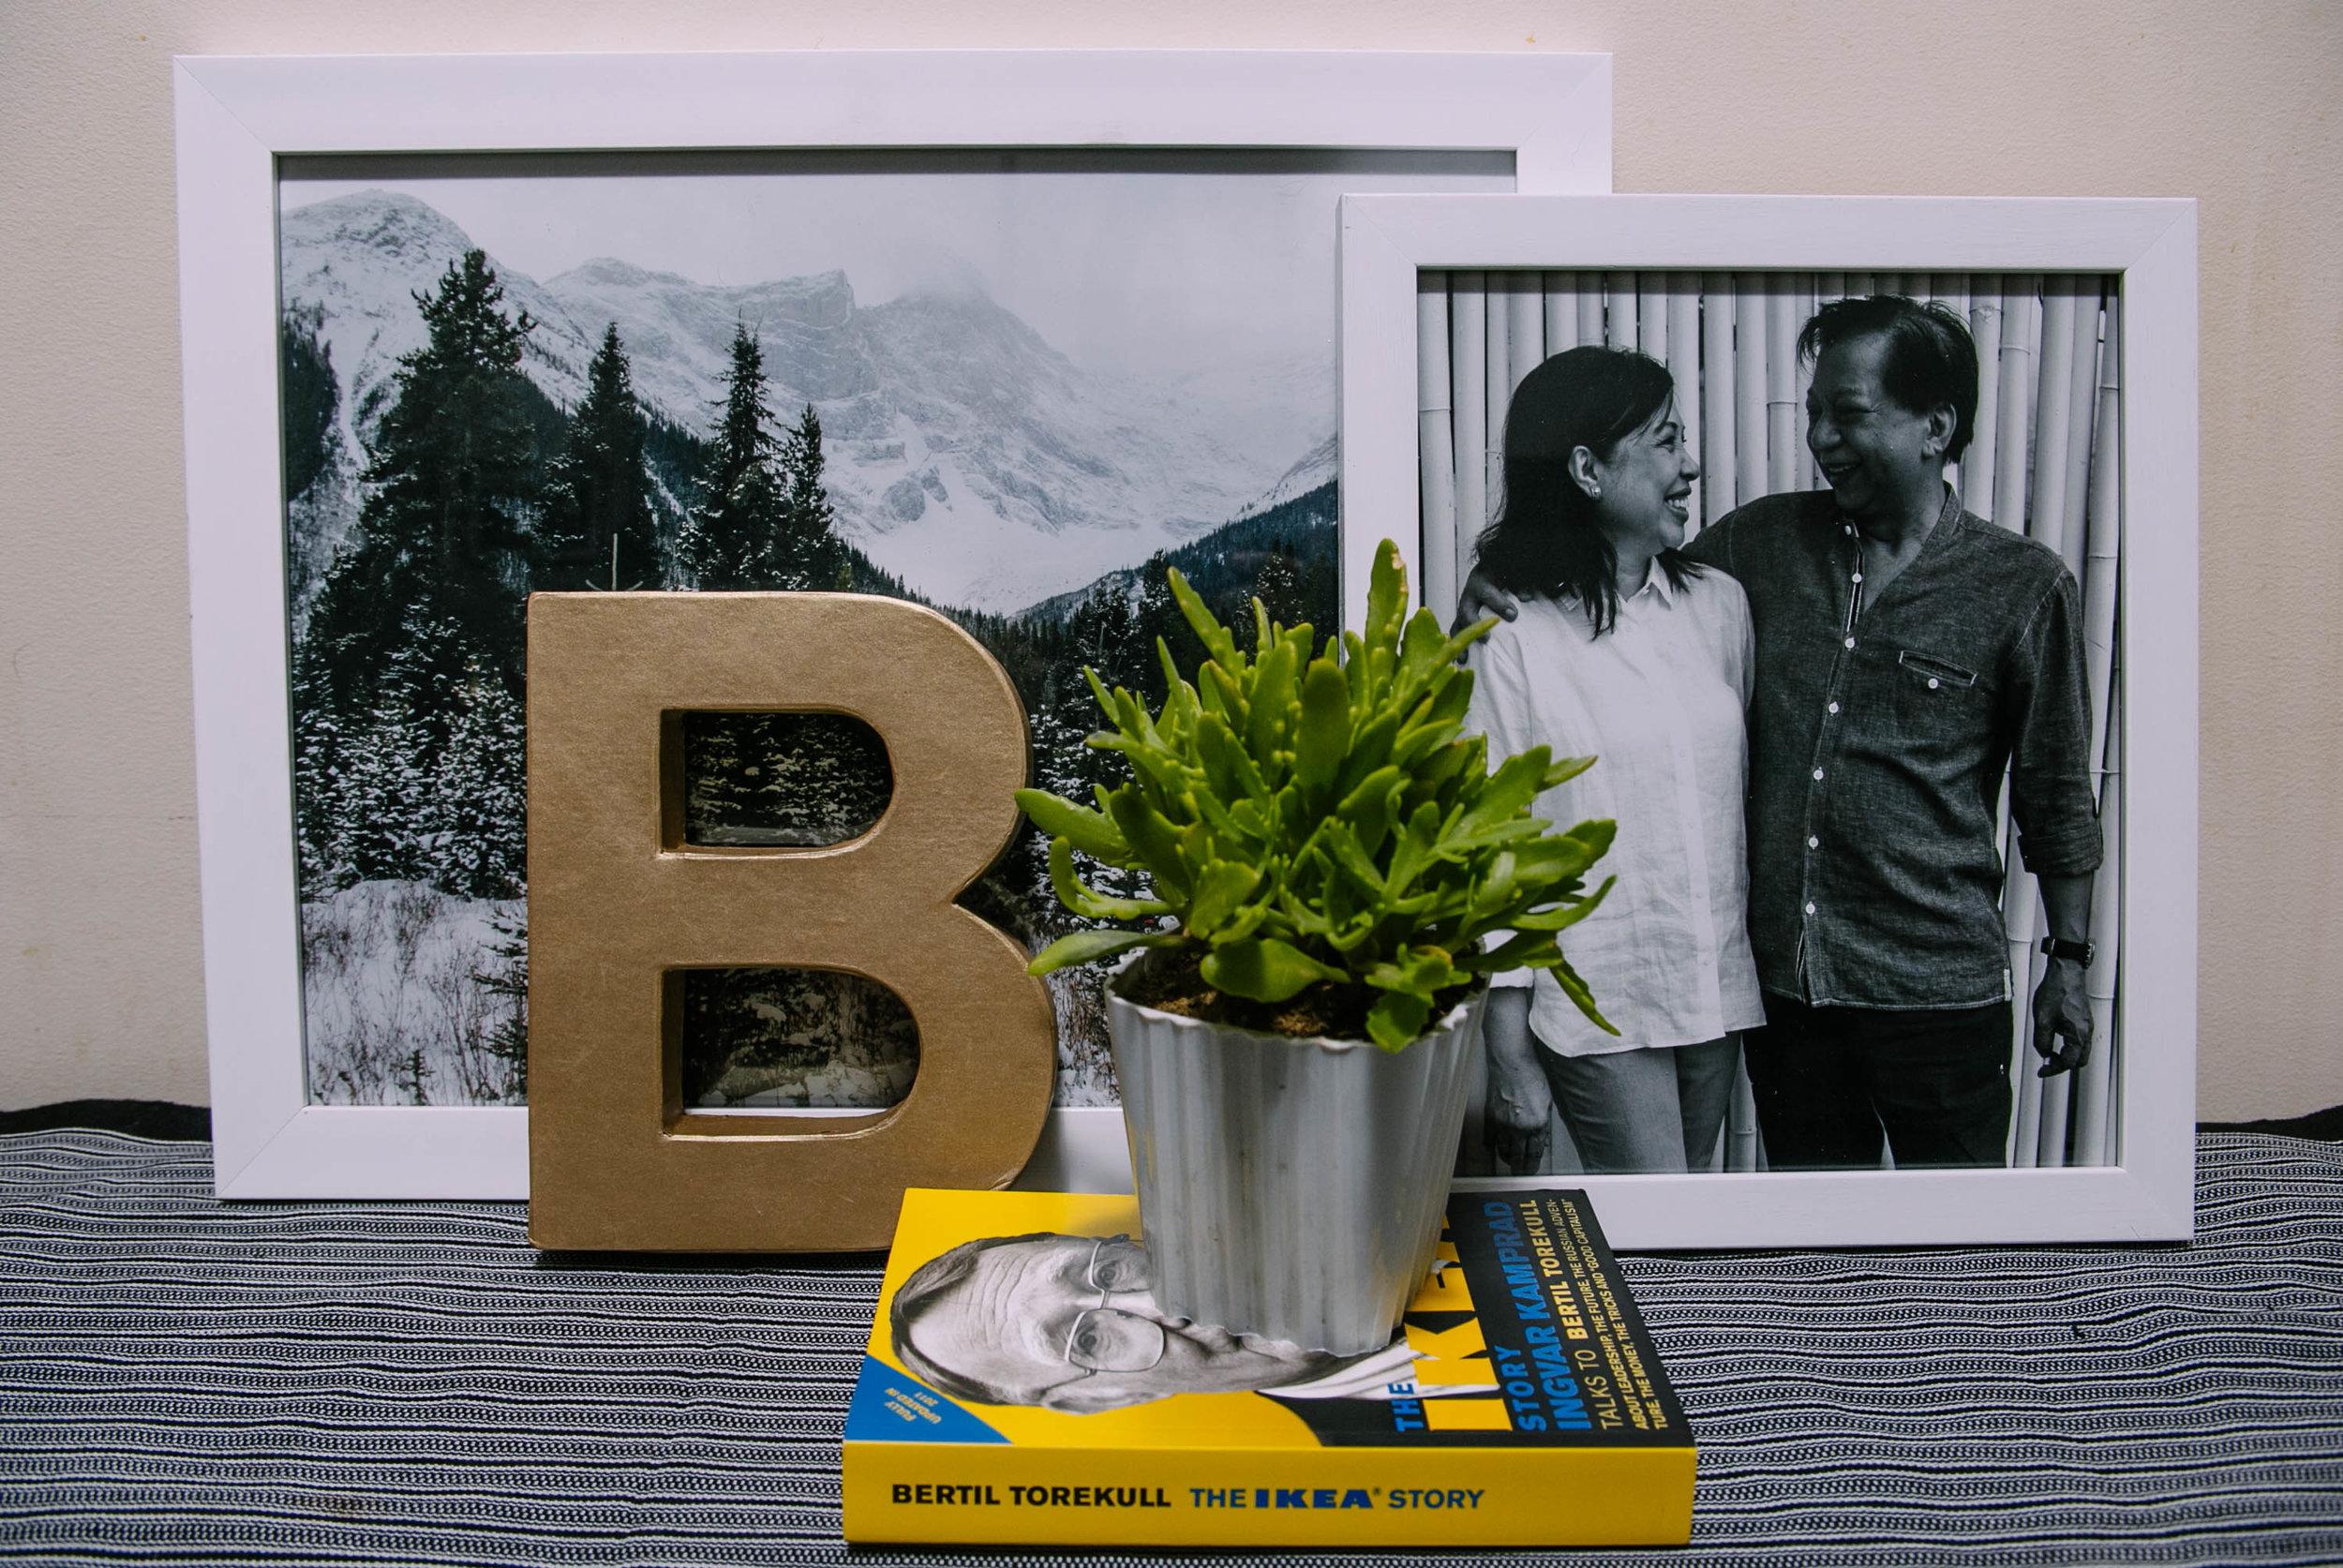 20190106 - b_setting - product shoot - frames and prints-5743.jpg